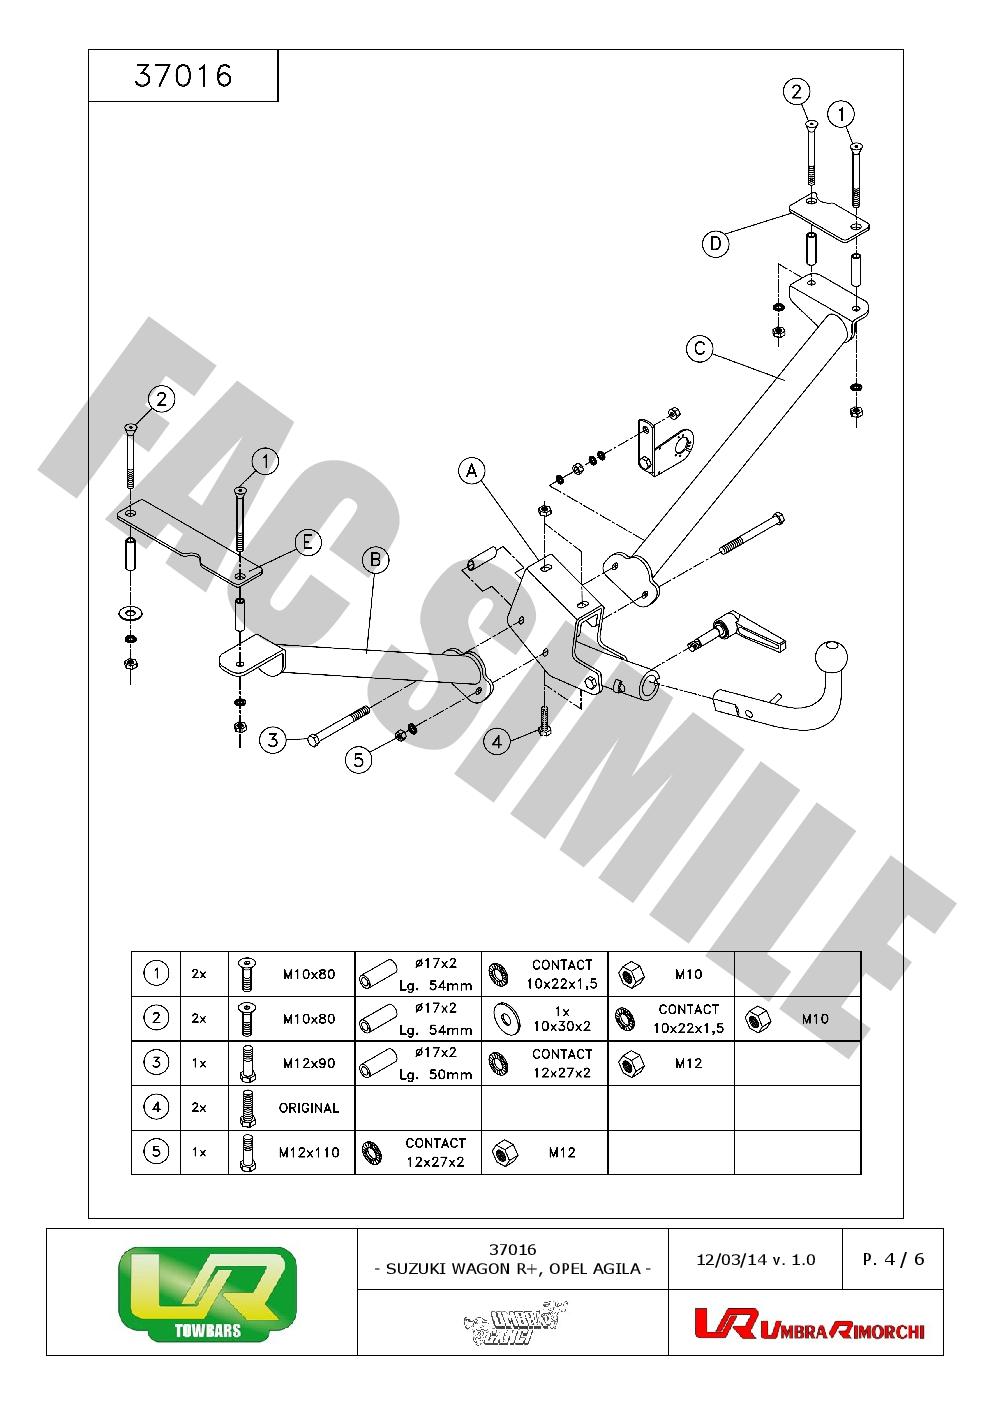 detach towbar 7pin wiring for suzuki wagon r 5seats mpv. Black Bedroom Furniture Sets. Home Design Ideas